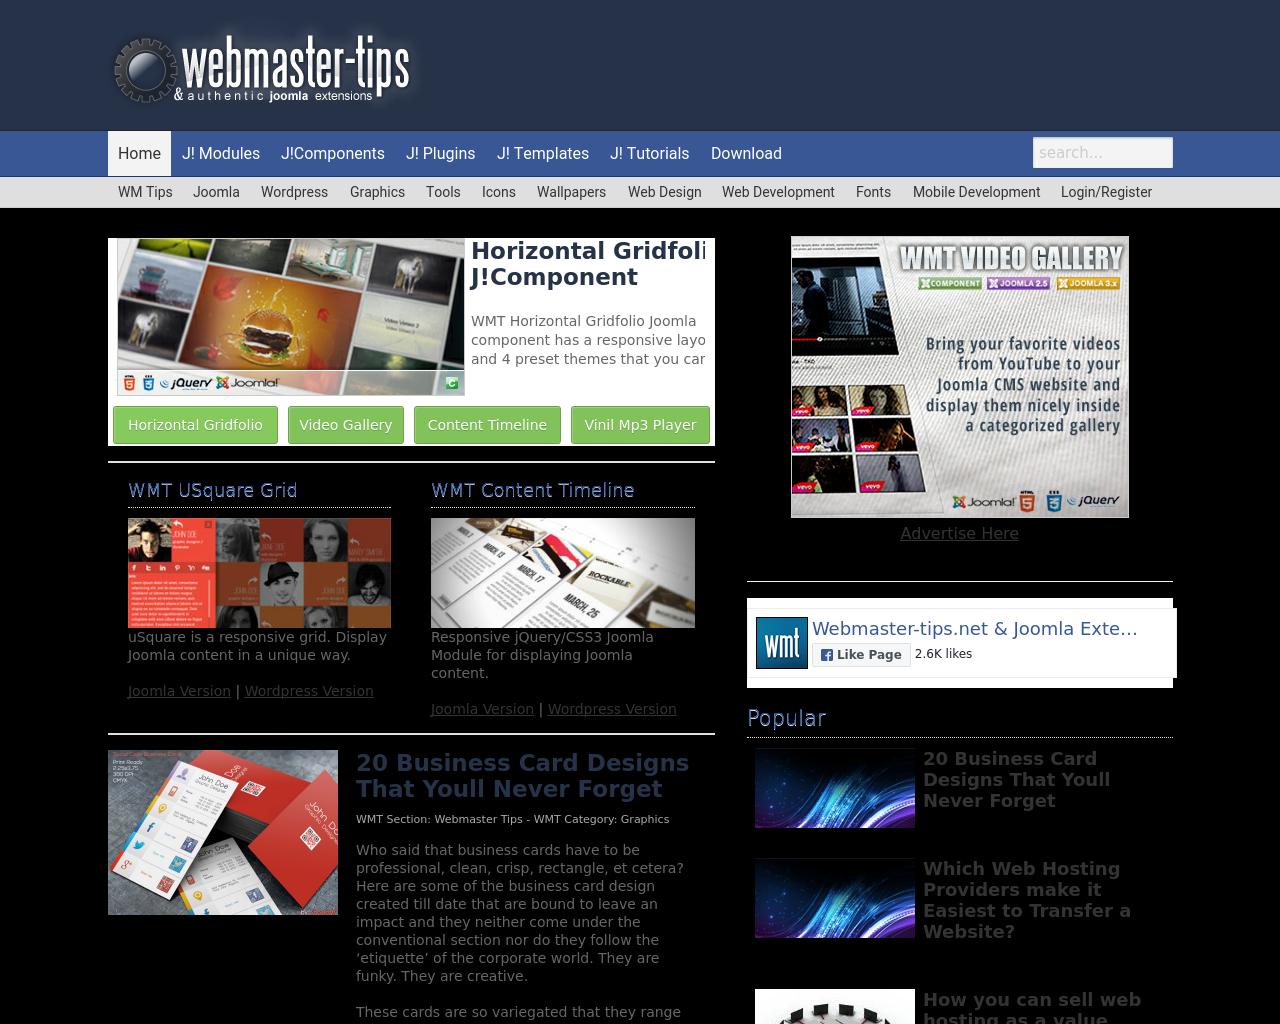 Webmaster-tips-Advertising-Reviews-Pricing